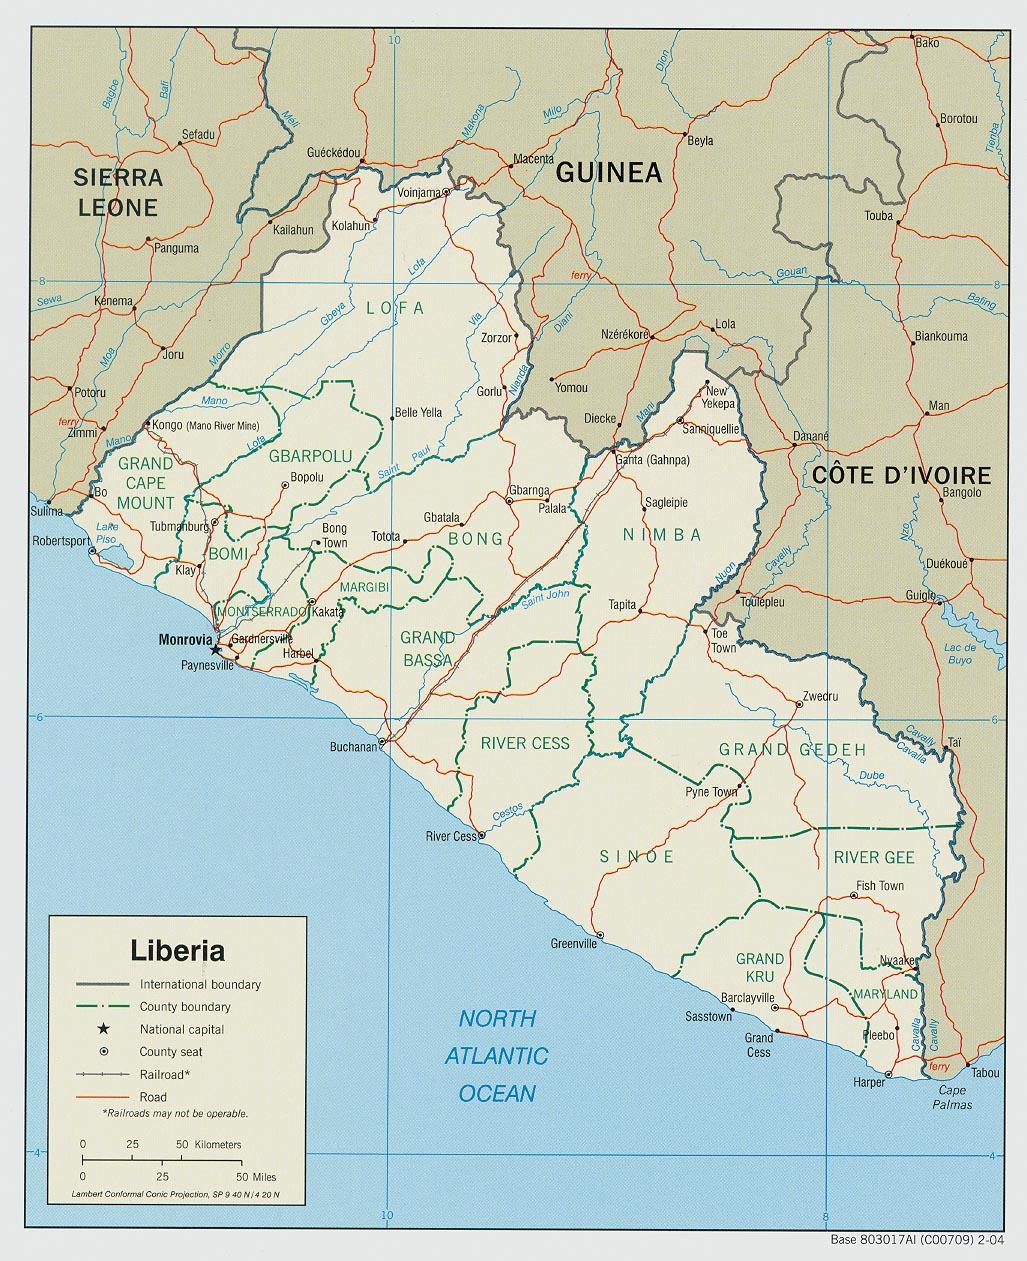 Download Free Liberia Maps - Liberia map